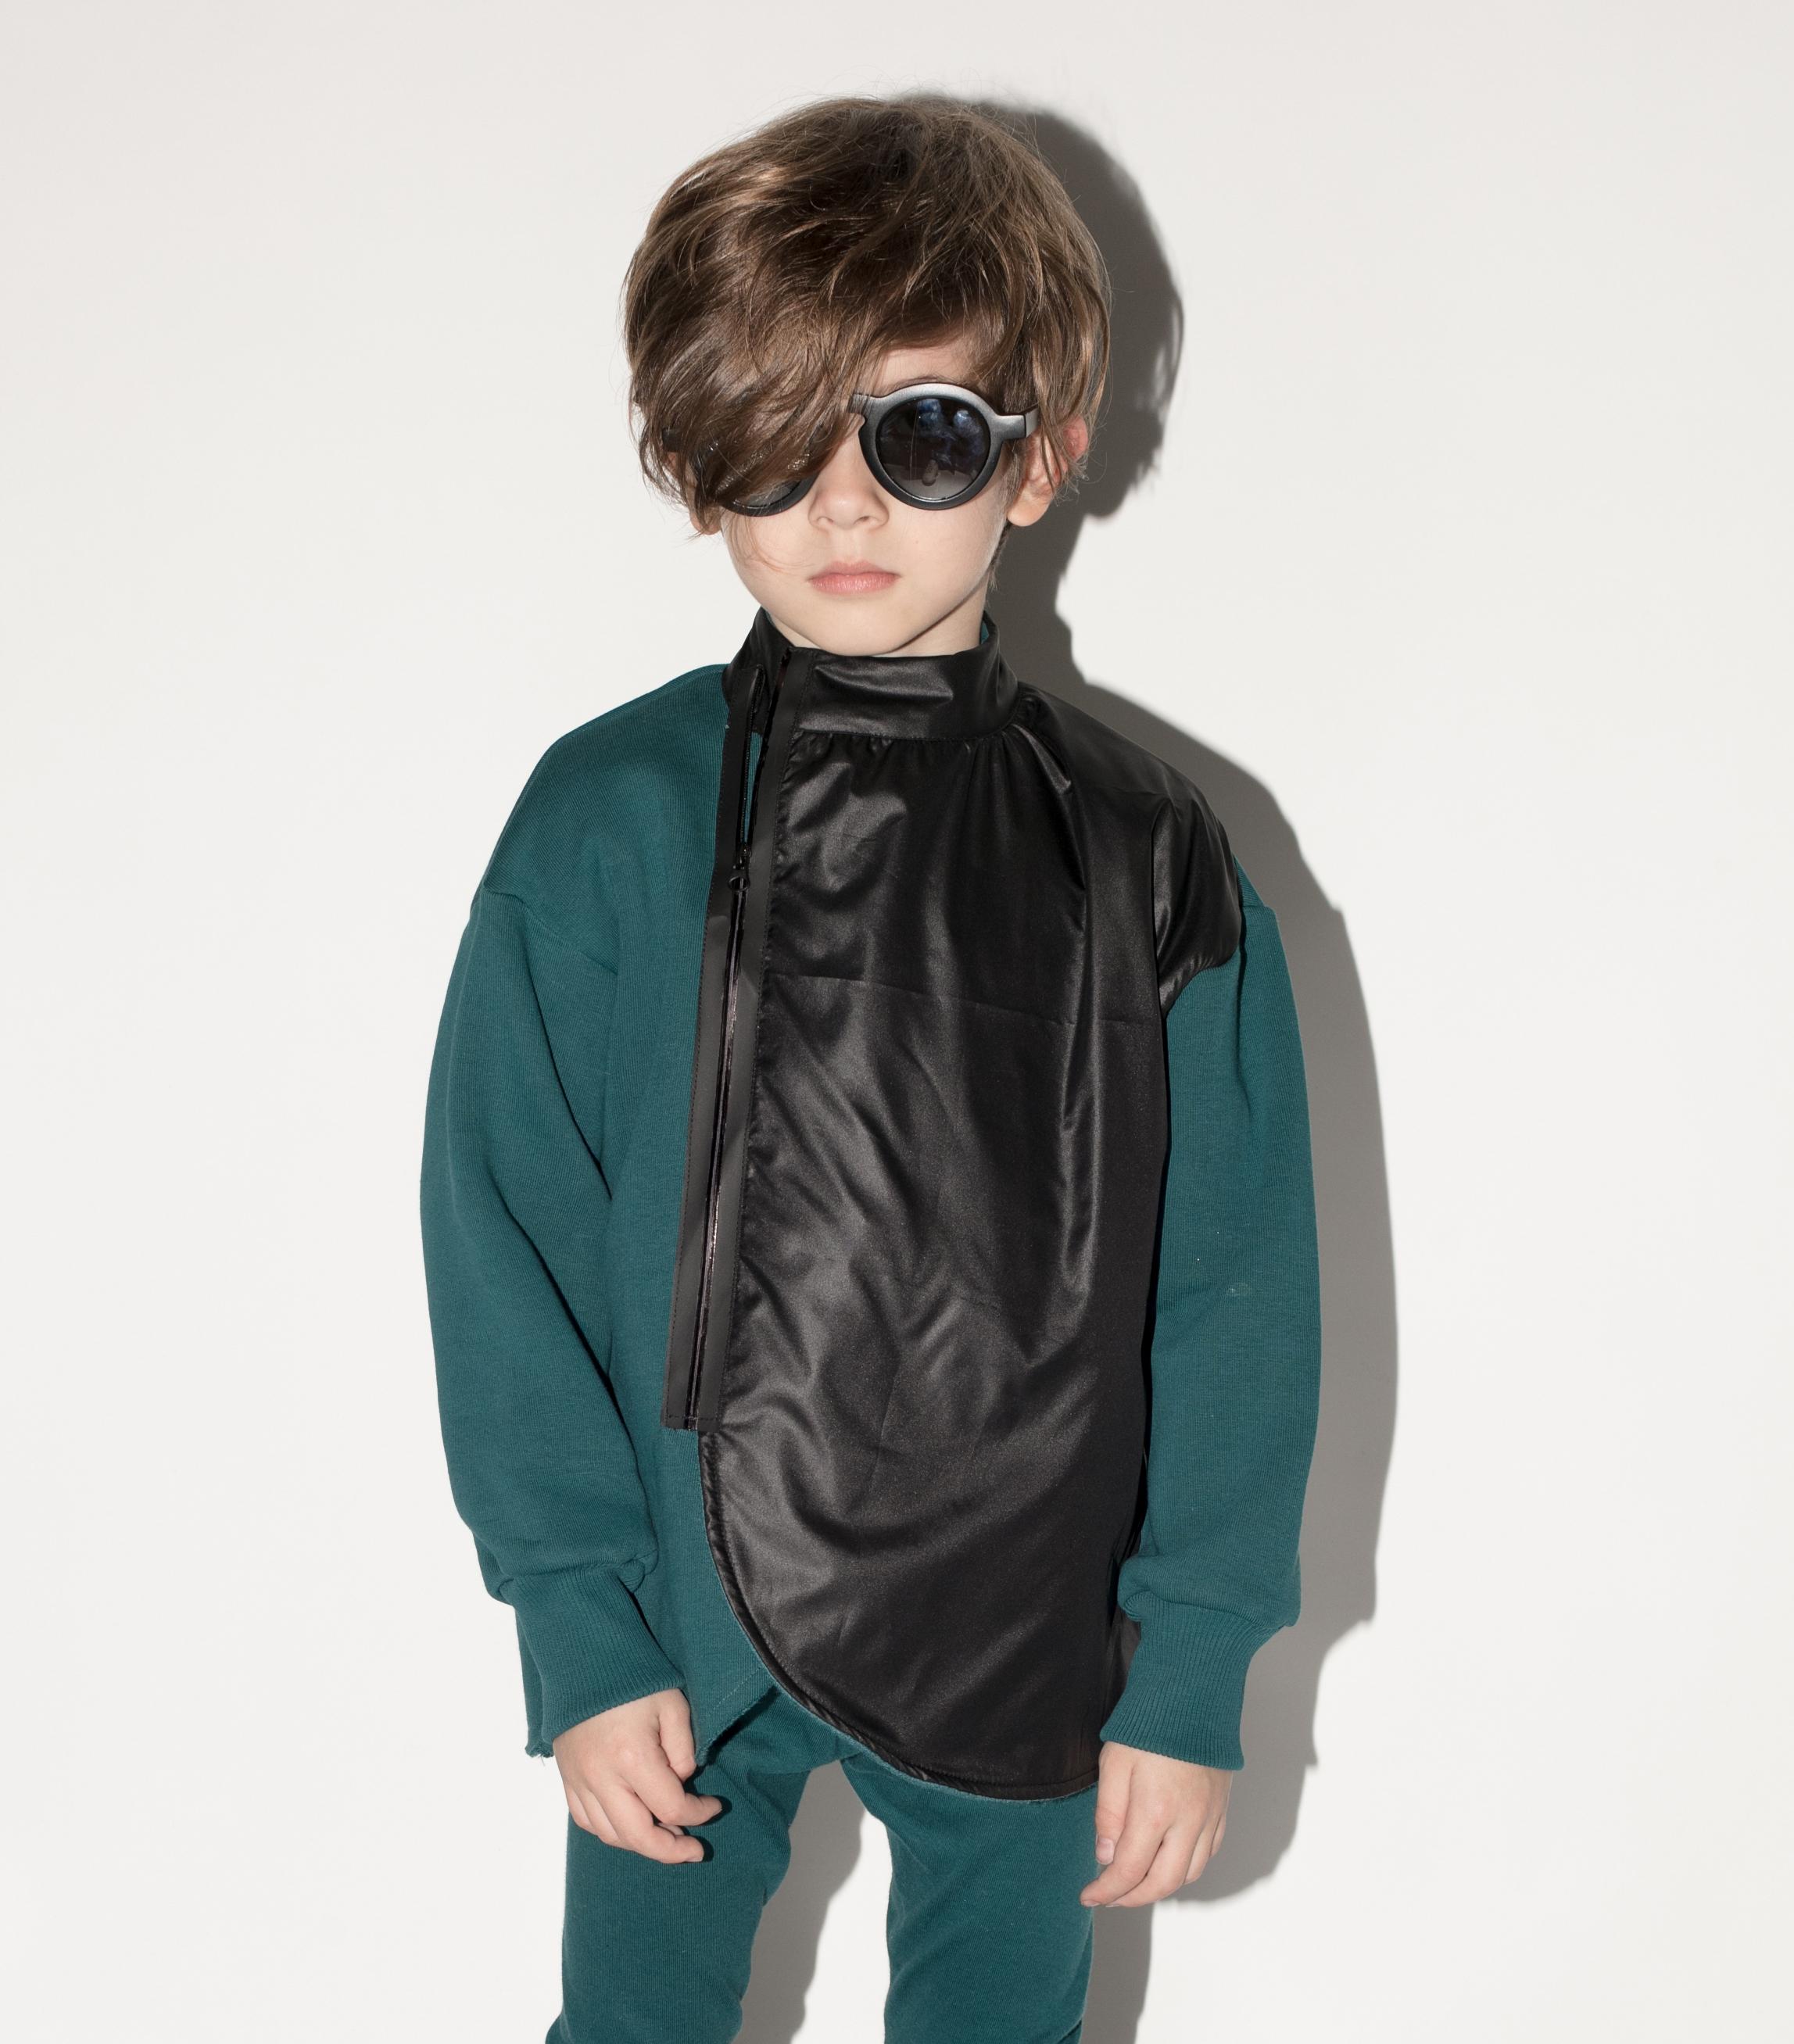 Shop for Cute Boys Kids Clothes